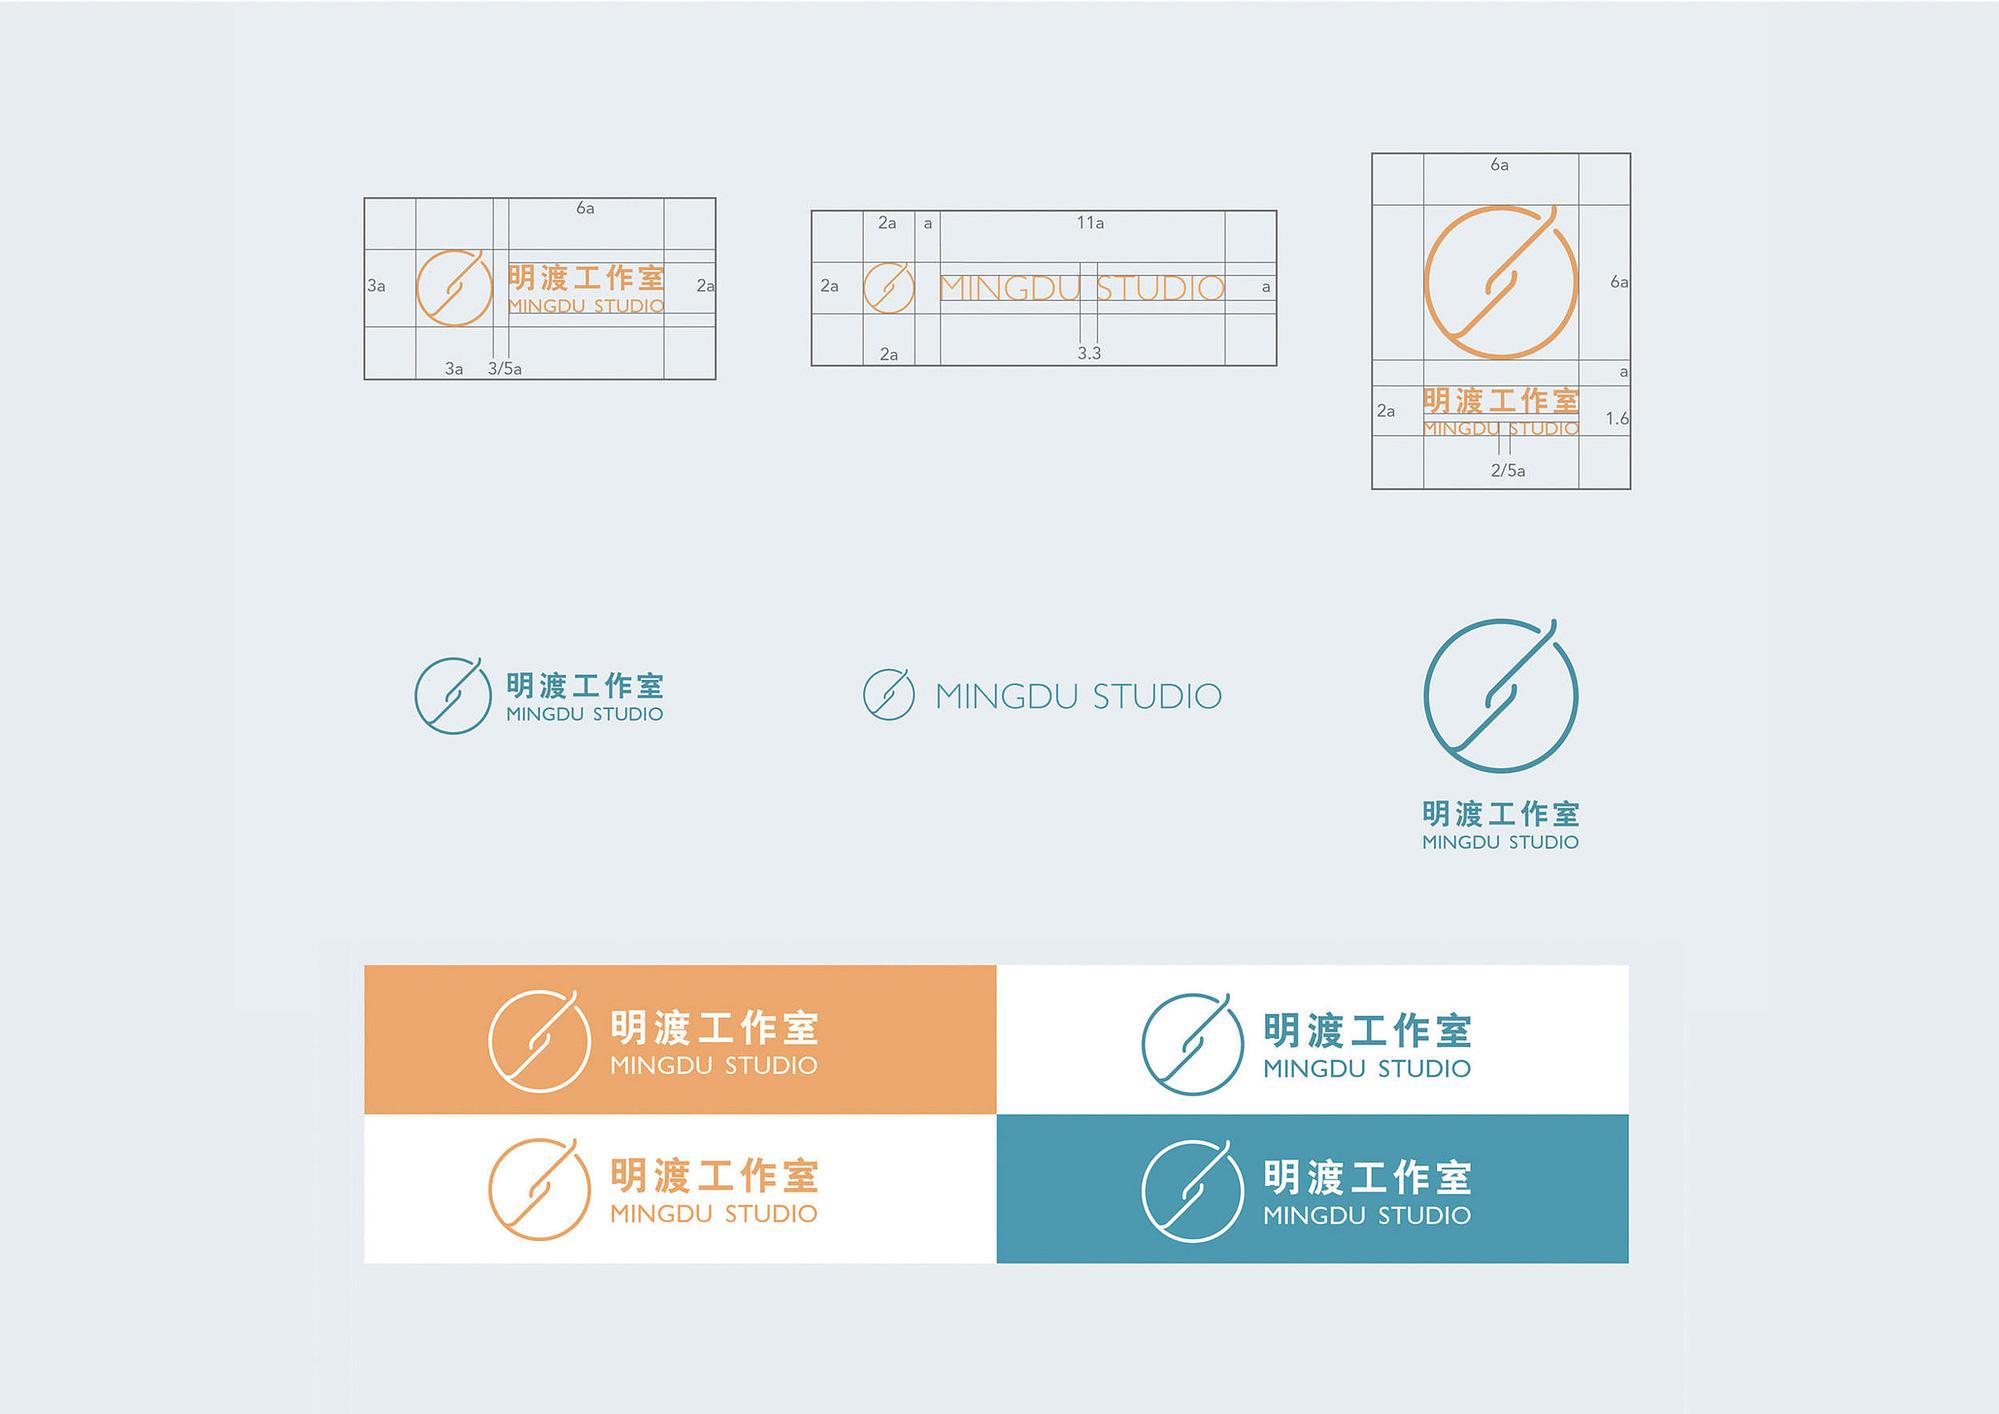 MINGDU STUDIO VI DESIGN 3